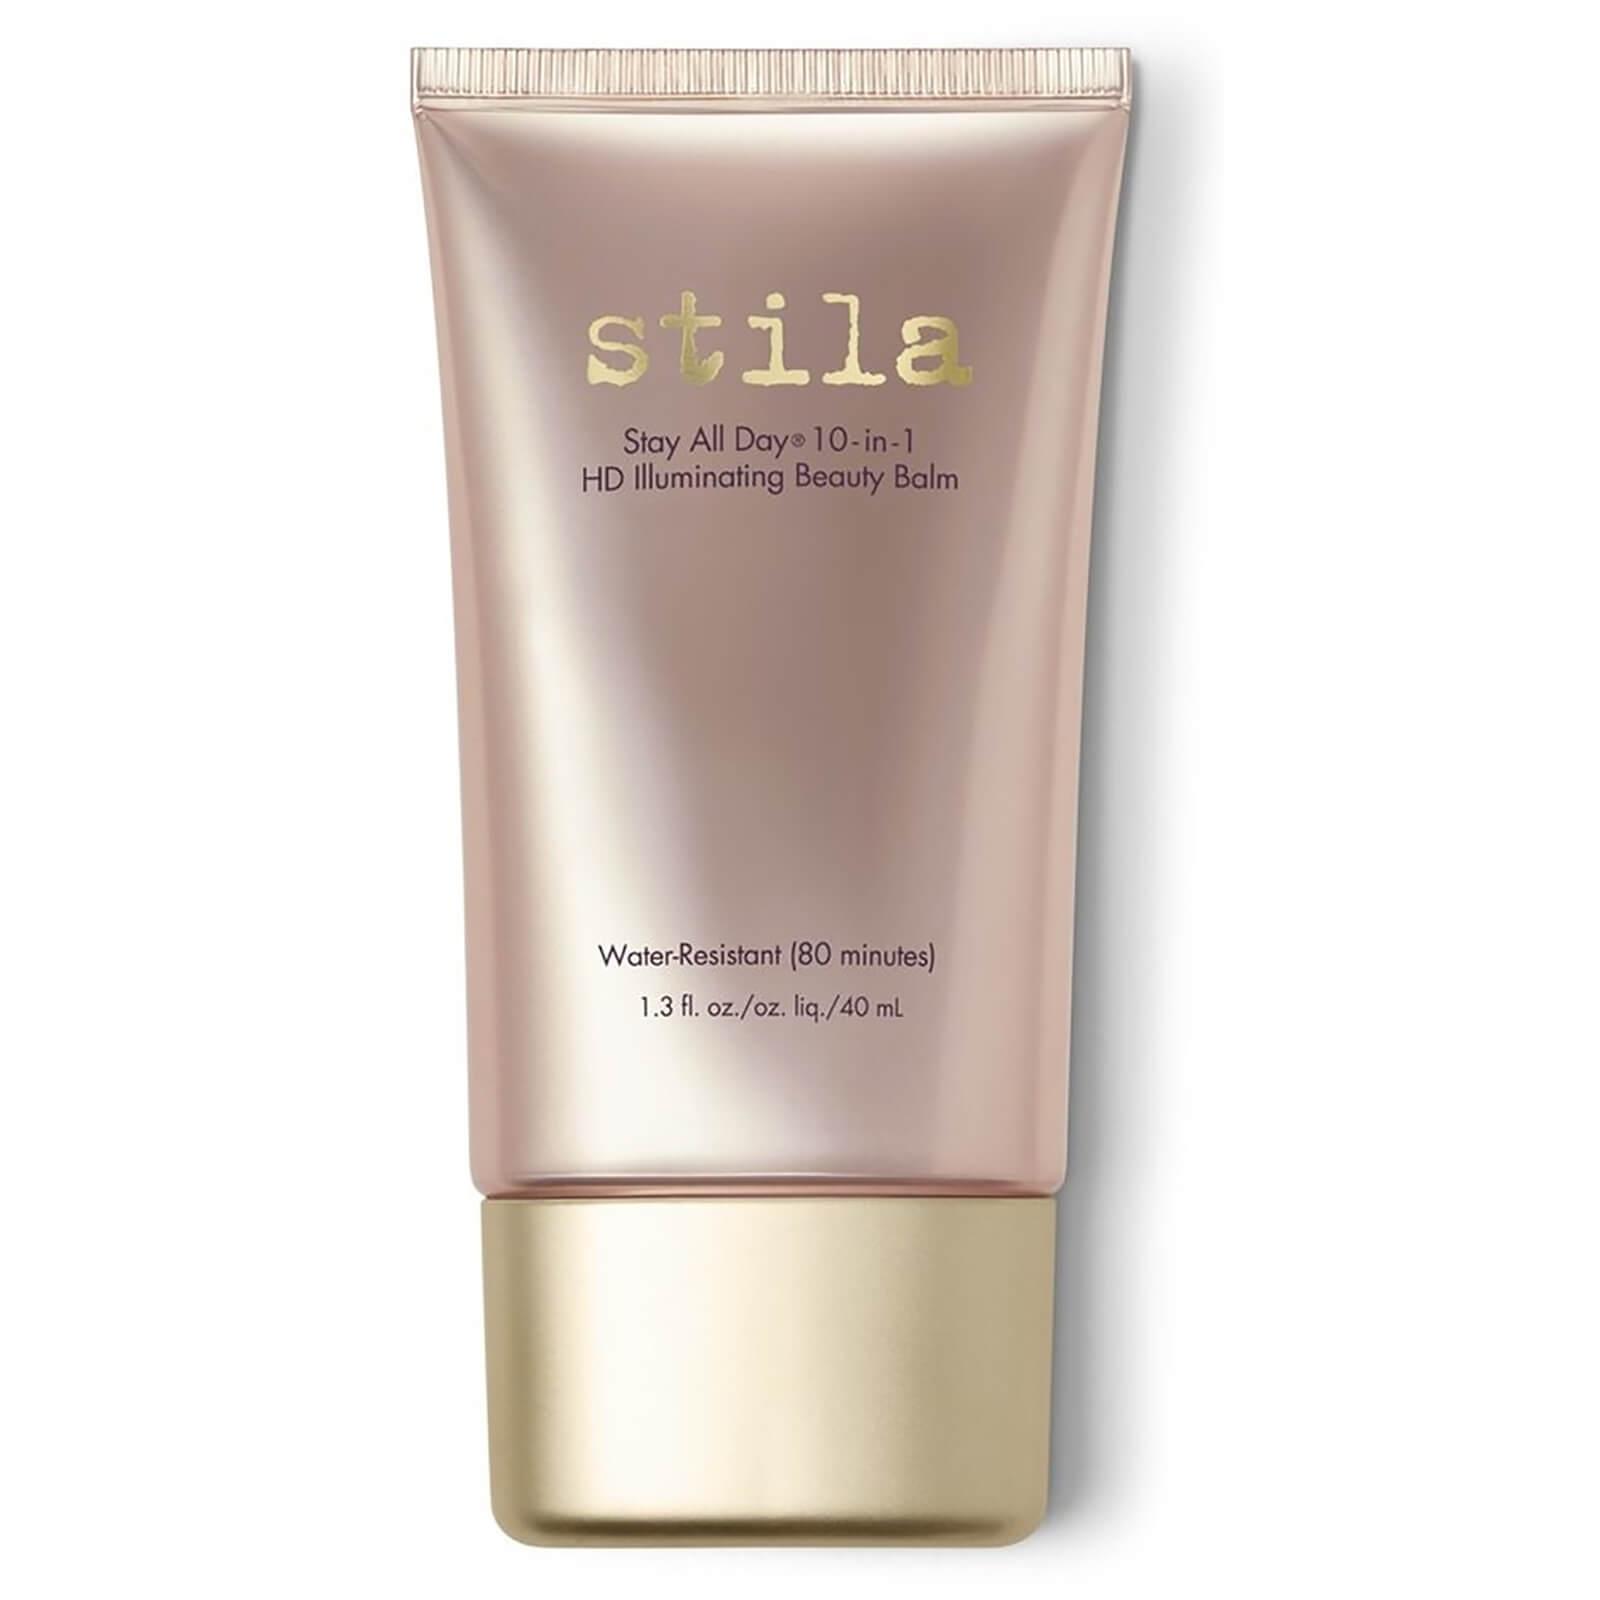 Stila Stay All Day 10-in-1 Illuminating Beauty Balm SPF30 | Free Shipping